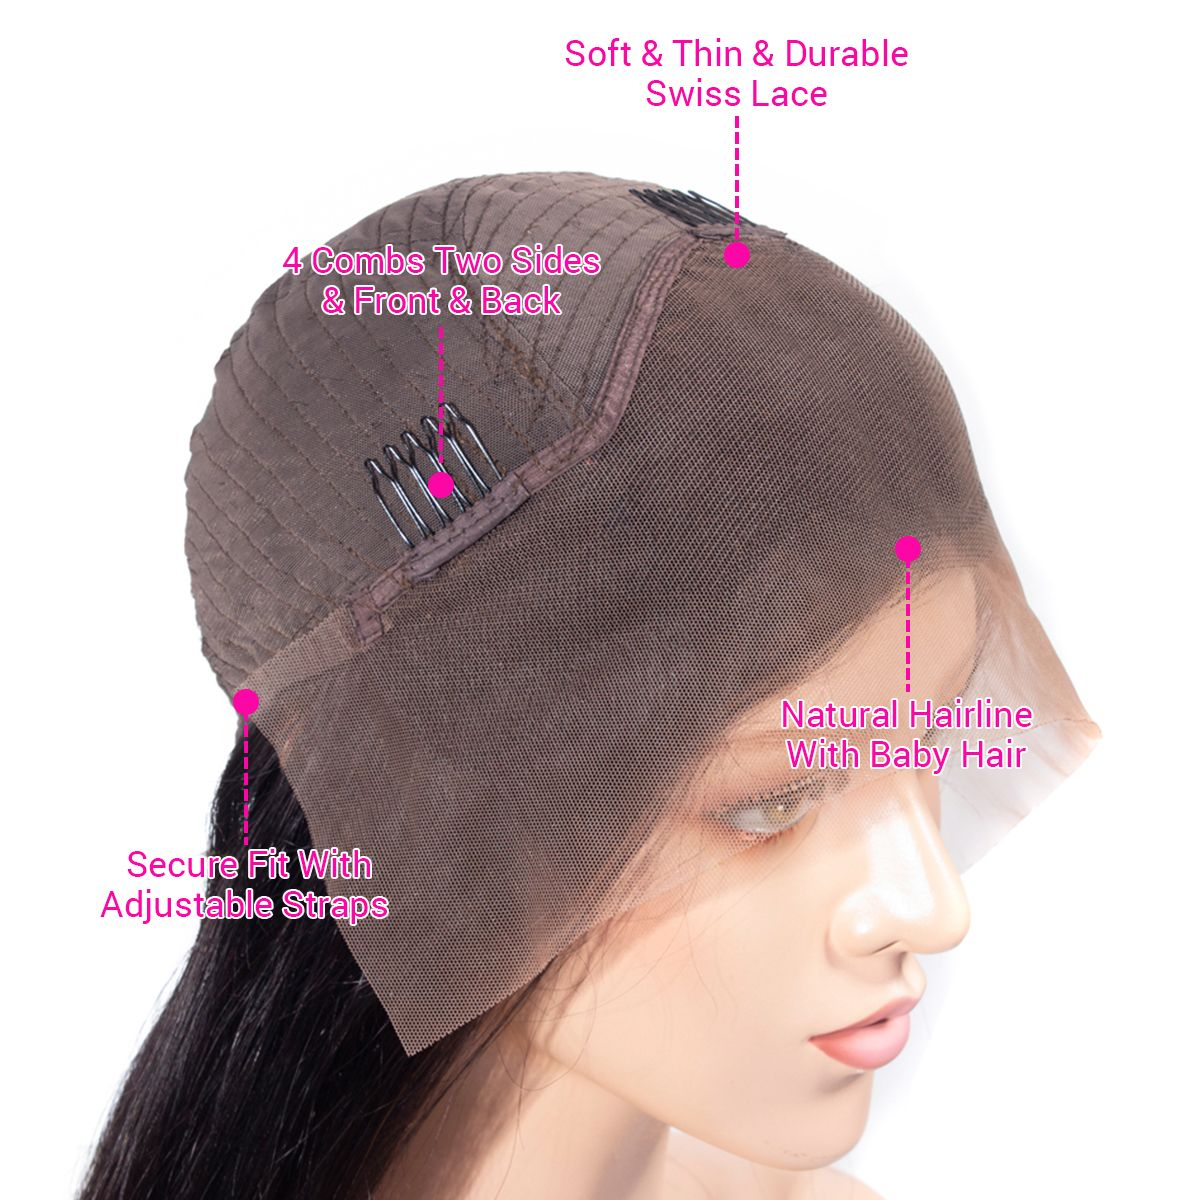 13x4 lace front wig details